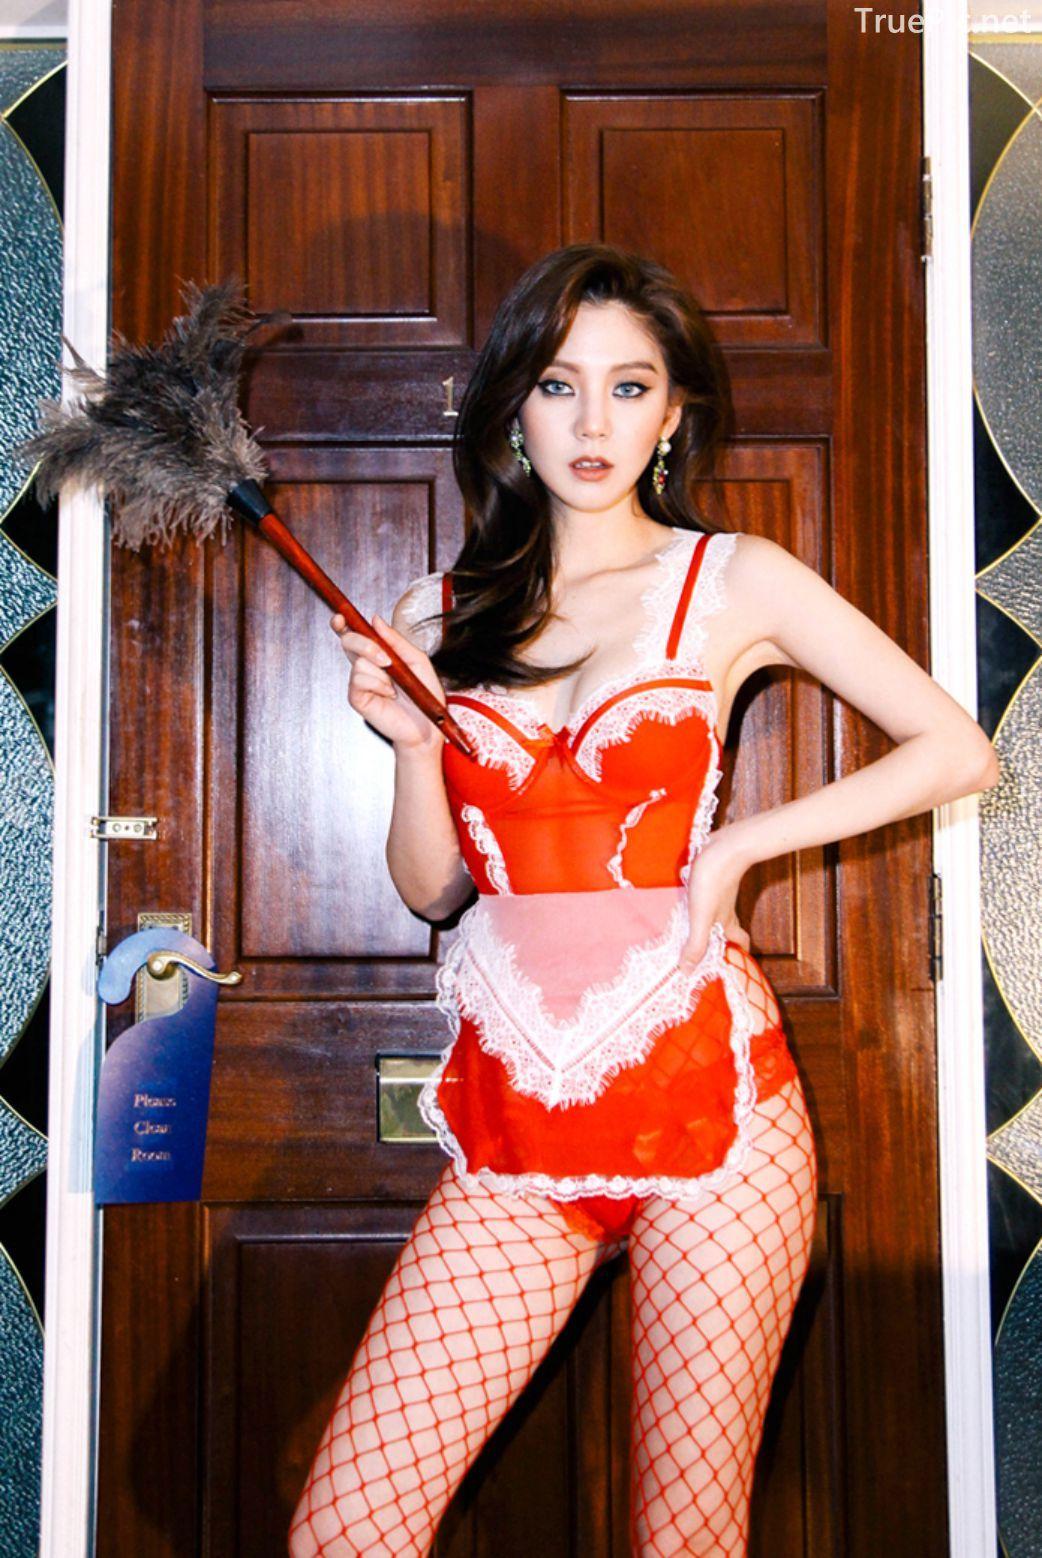 Lee Chae Eun - Korean Lingerie Model - Love Me More Sexy - TruePic.net - Picture 3